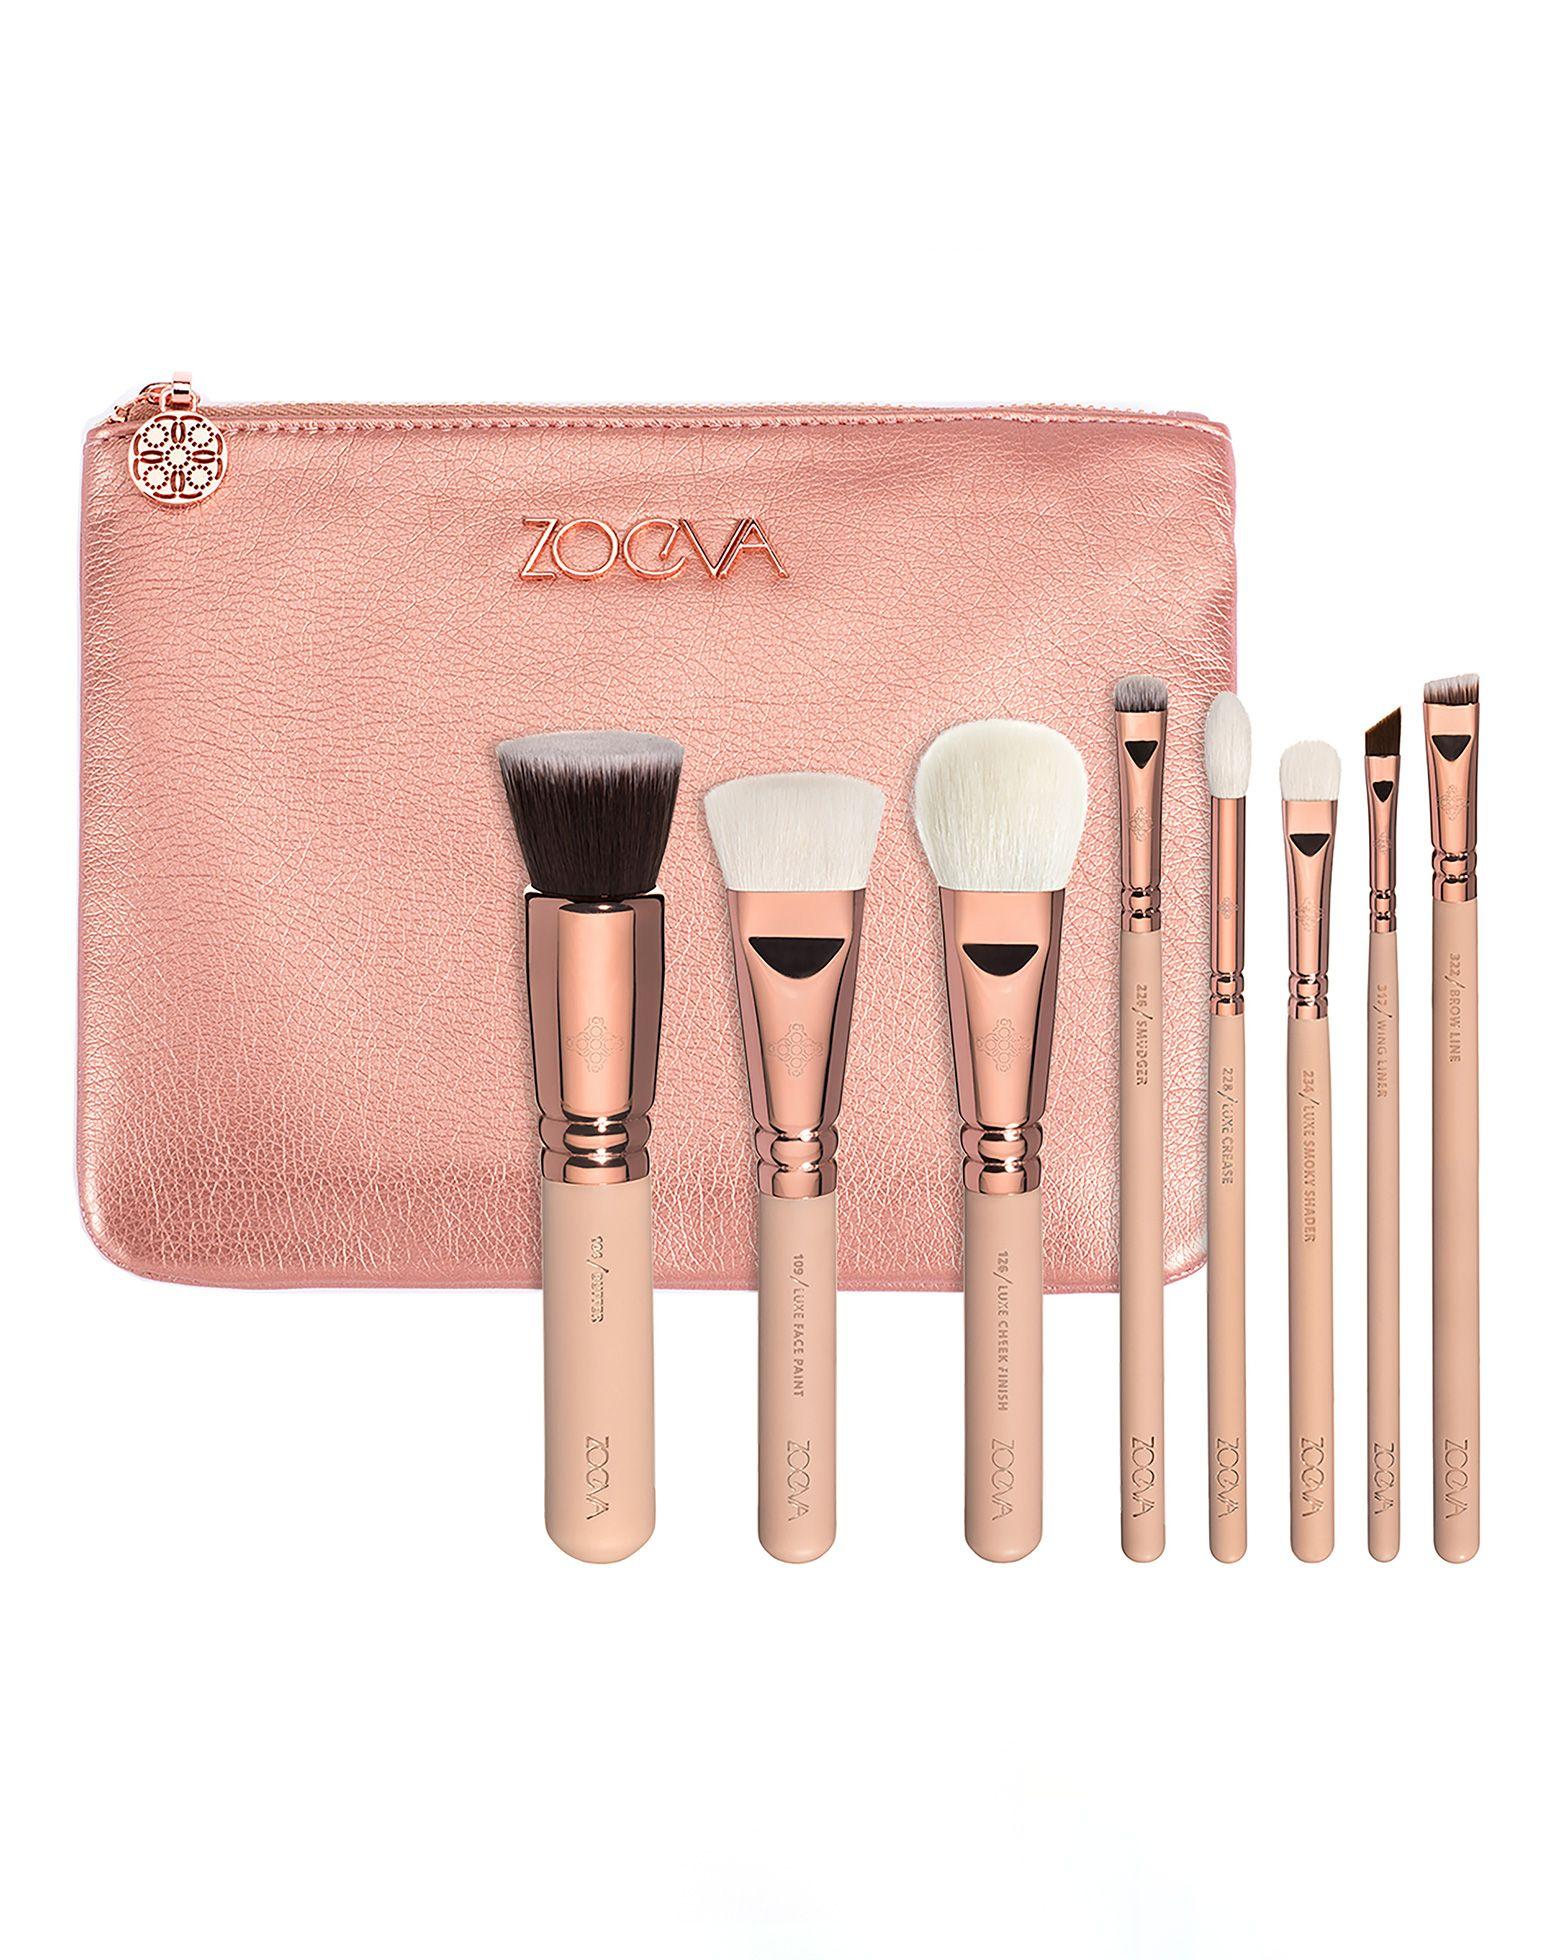 Rose Golden Luxury Brush Set Volume 2 by ZOEVA Makeup